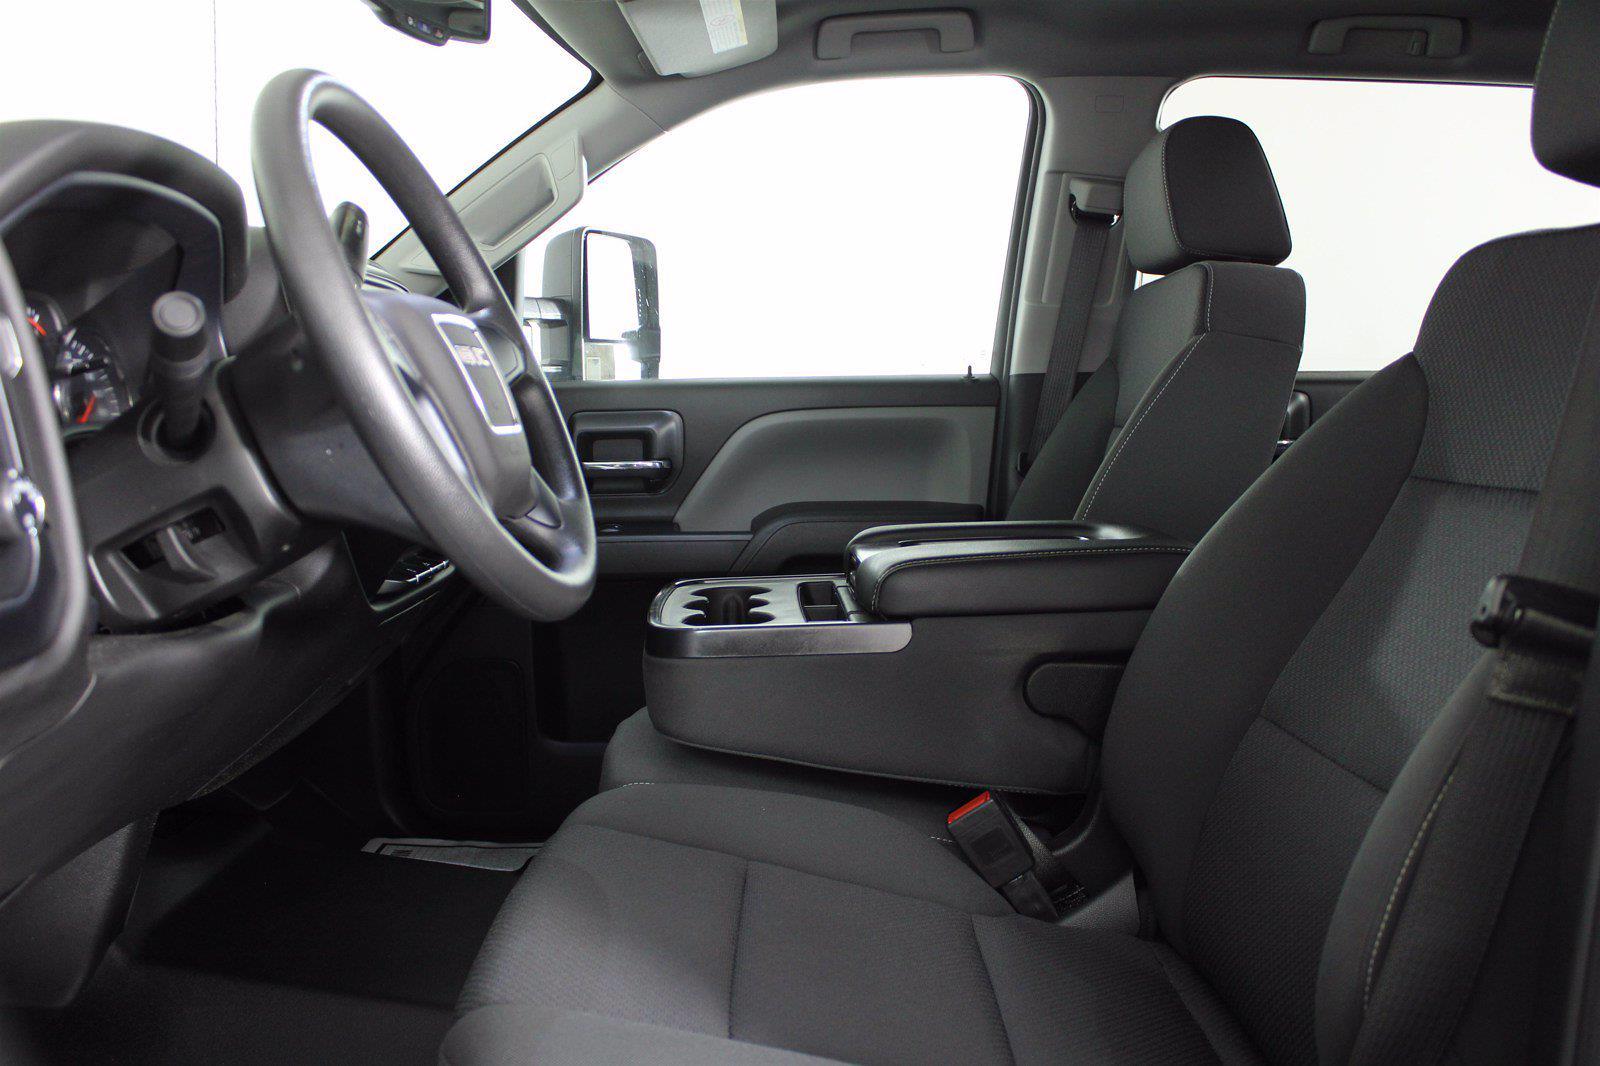 2019 GMC Sierra 2500 Crew Cab 4x4, Pickup #DAB0719 - photo 4